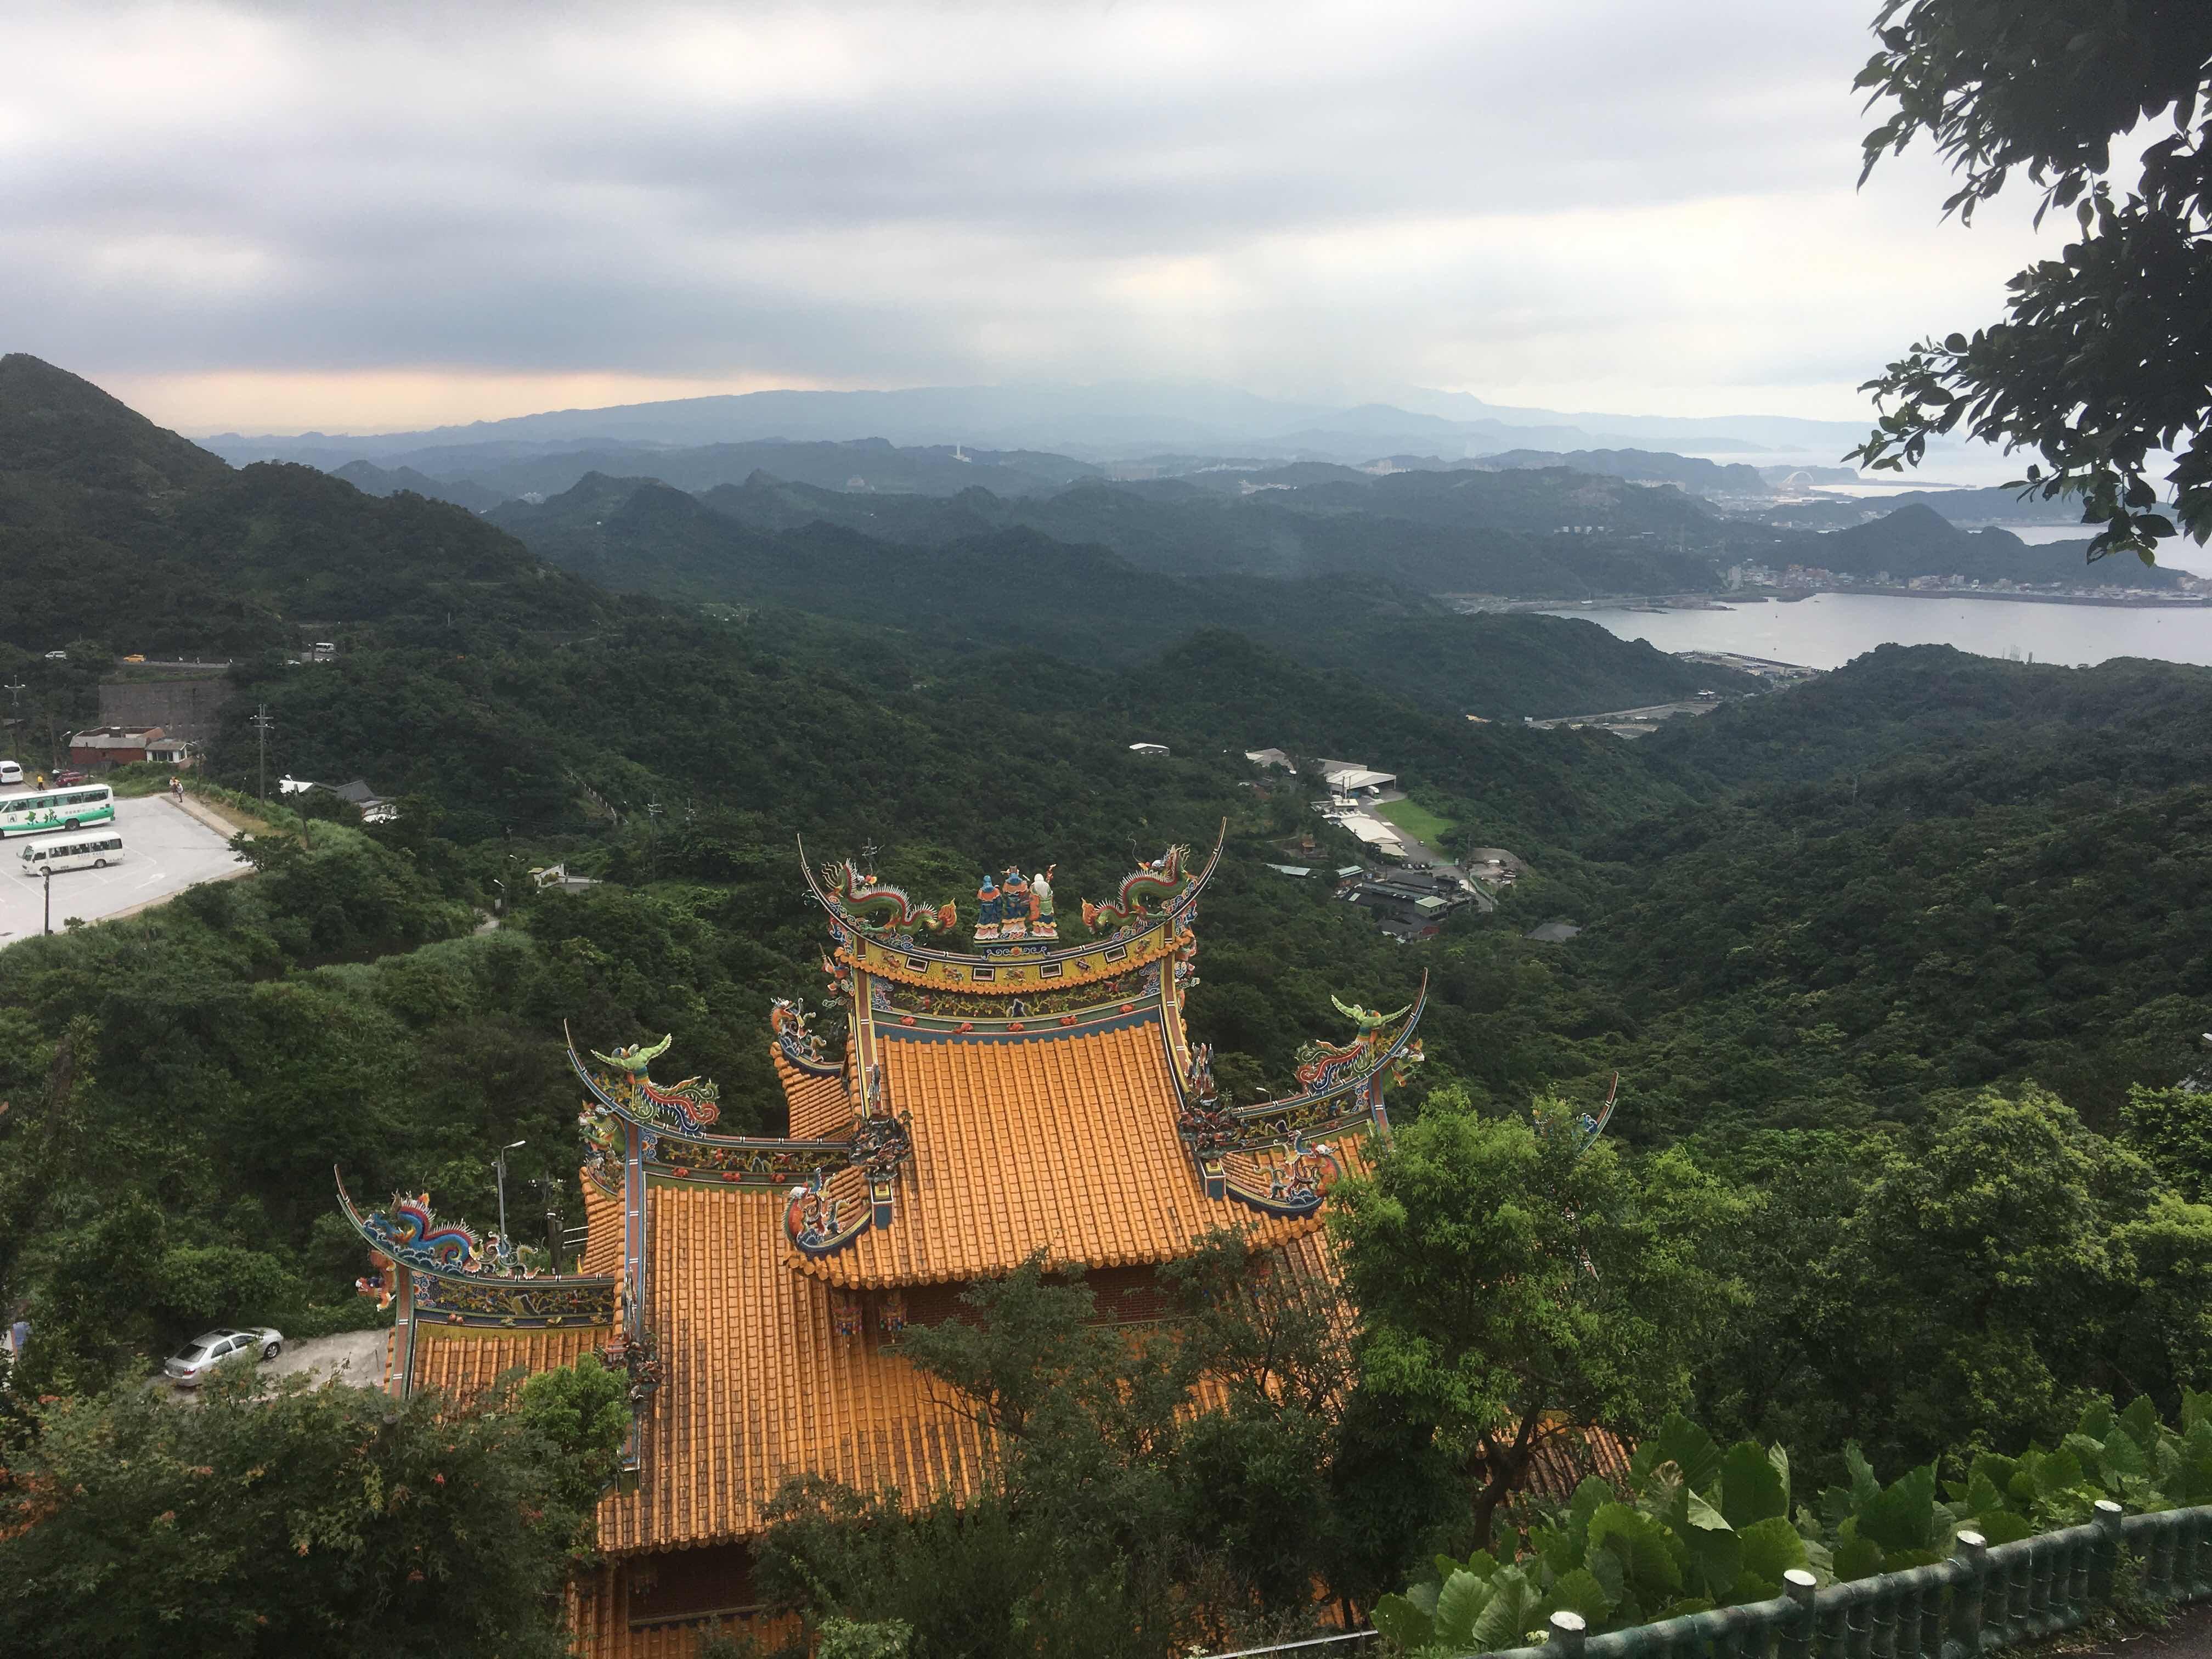 jiufen old street taipei ruifang jiufen taiwan temple sea mountains view